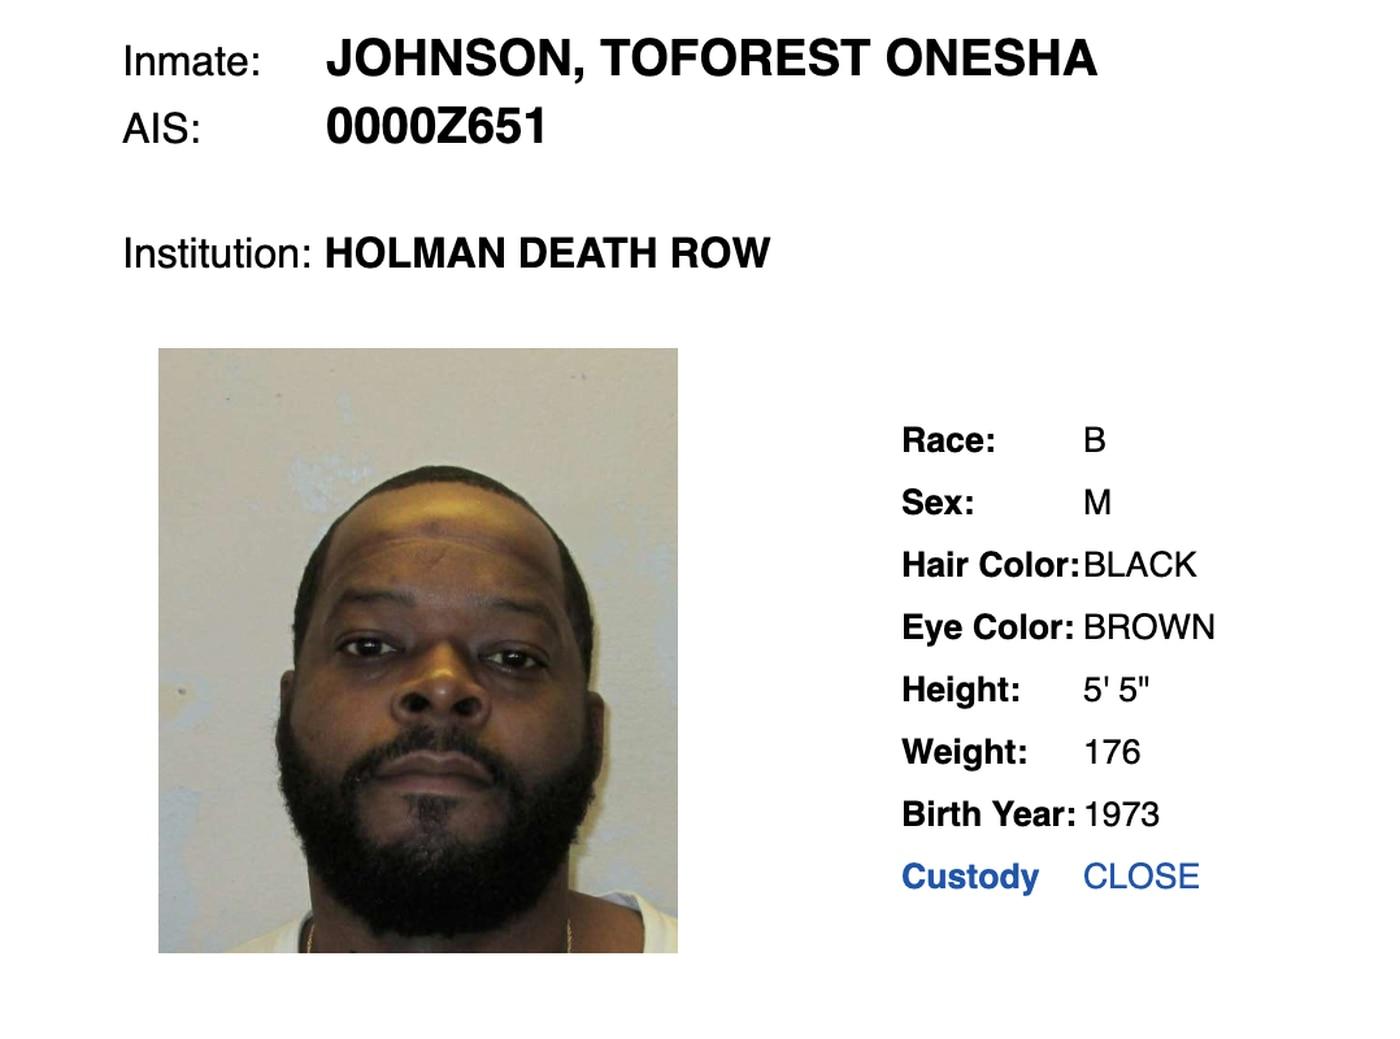 Man on Alabama's death row for murder of deputy says he's